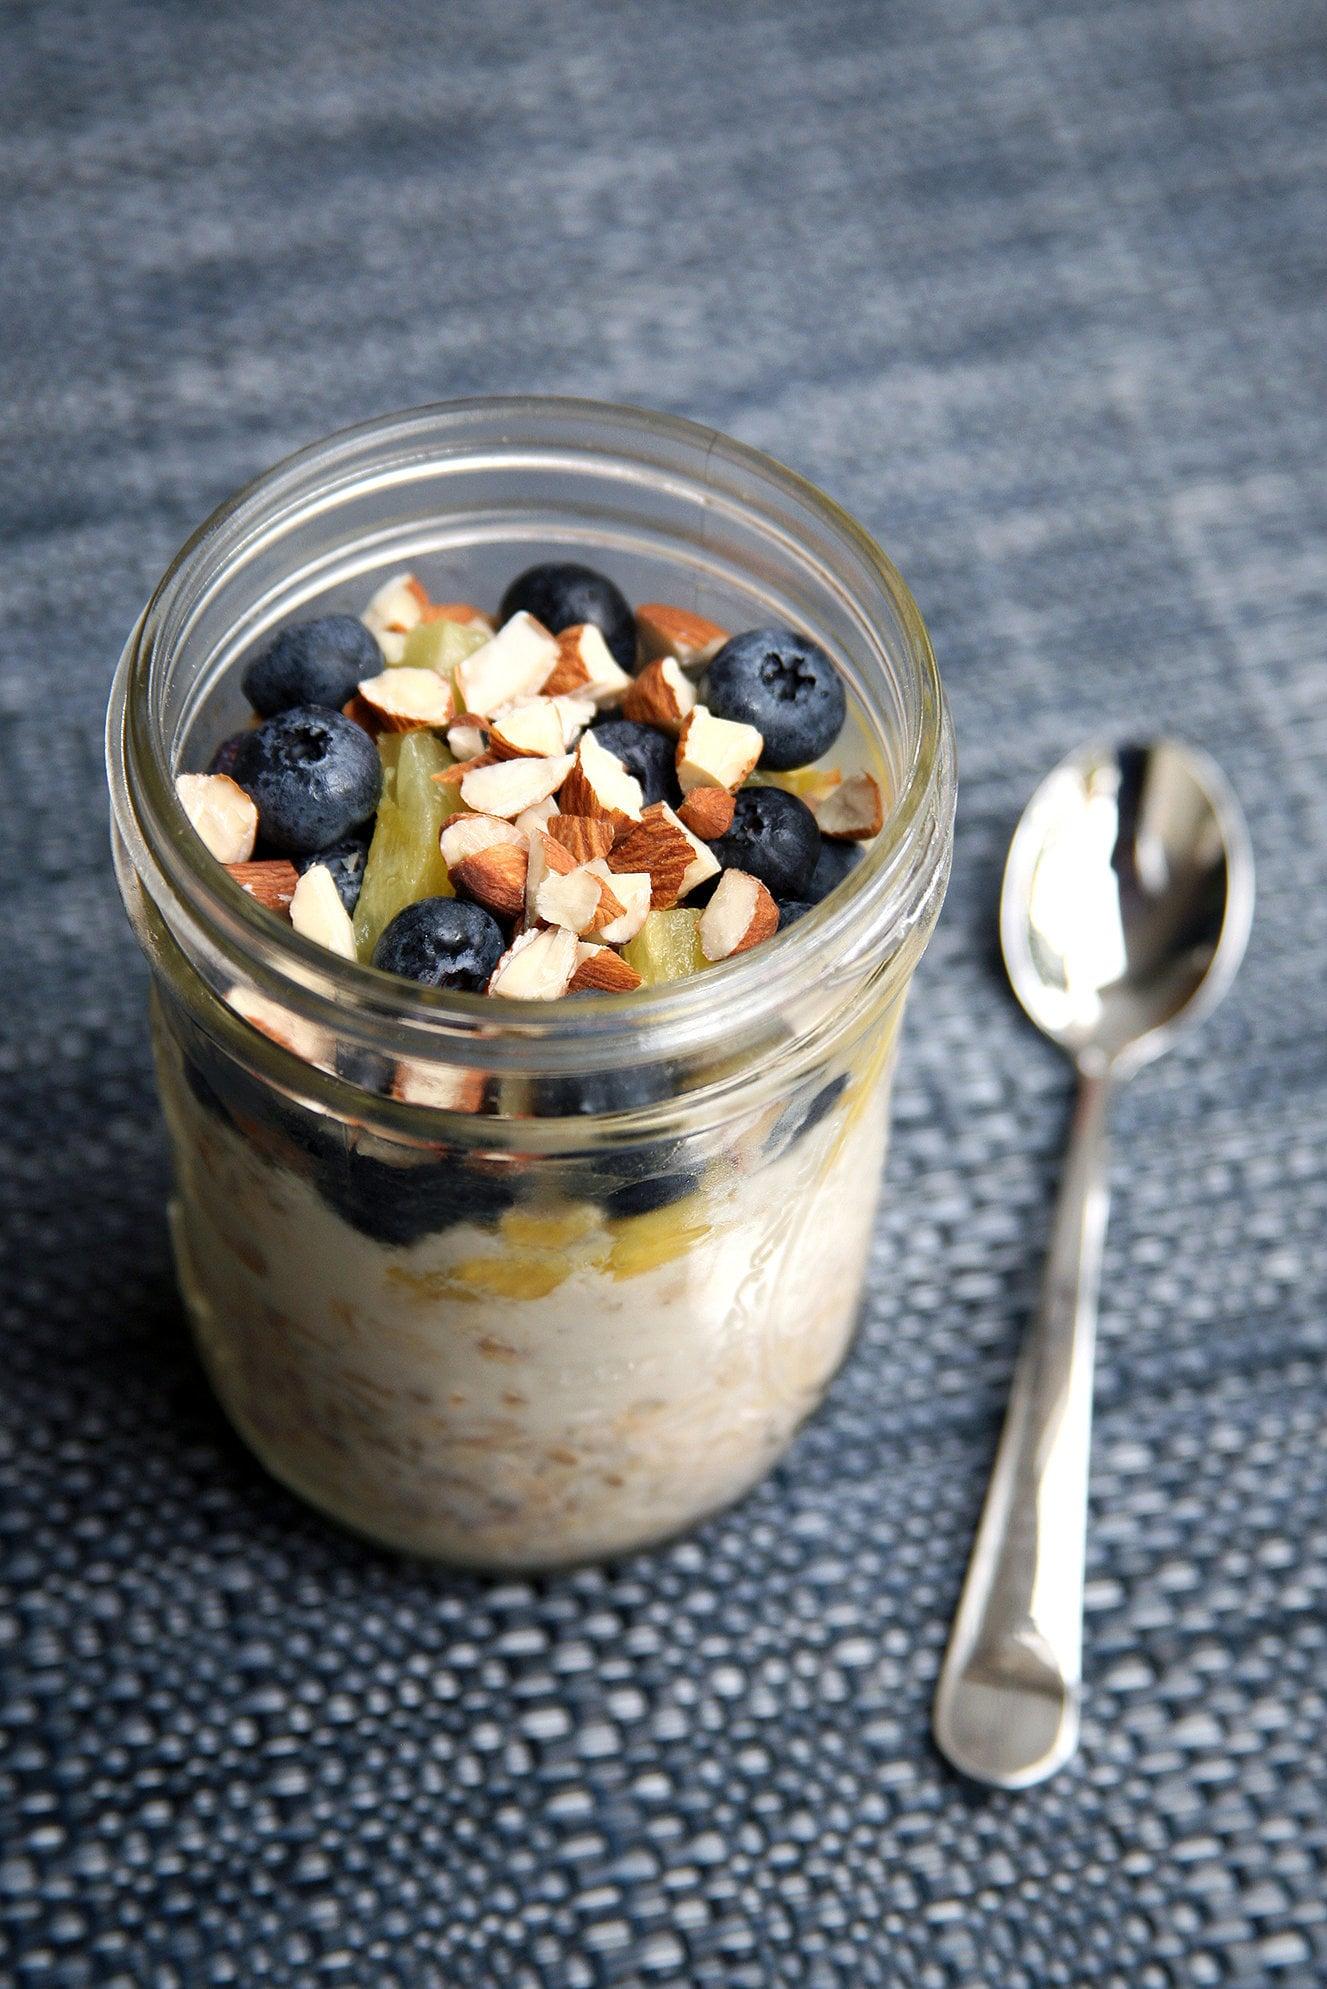 Flat Belly Overnight >> Flat Belly Overnight Oats 22 Tasty Breakfast Recipes That